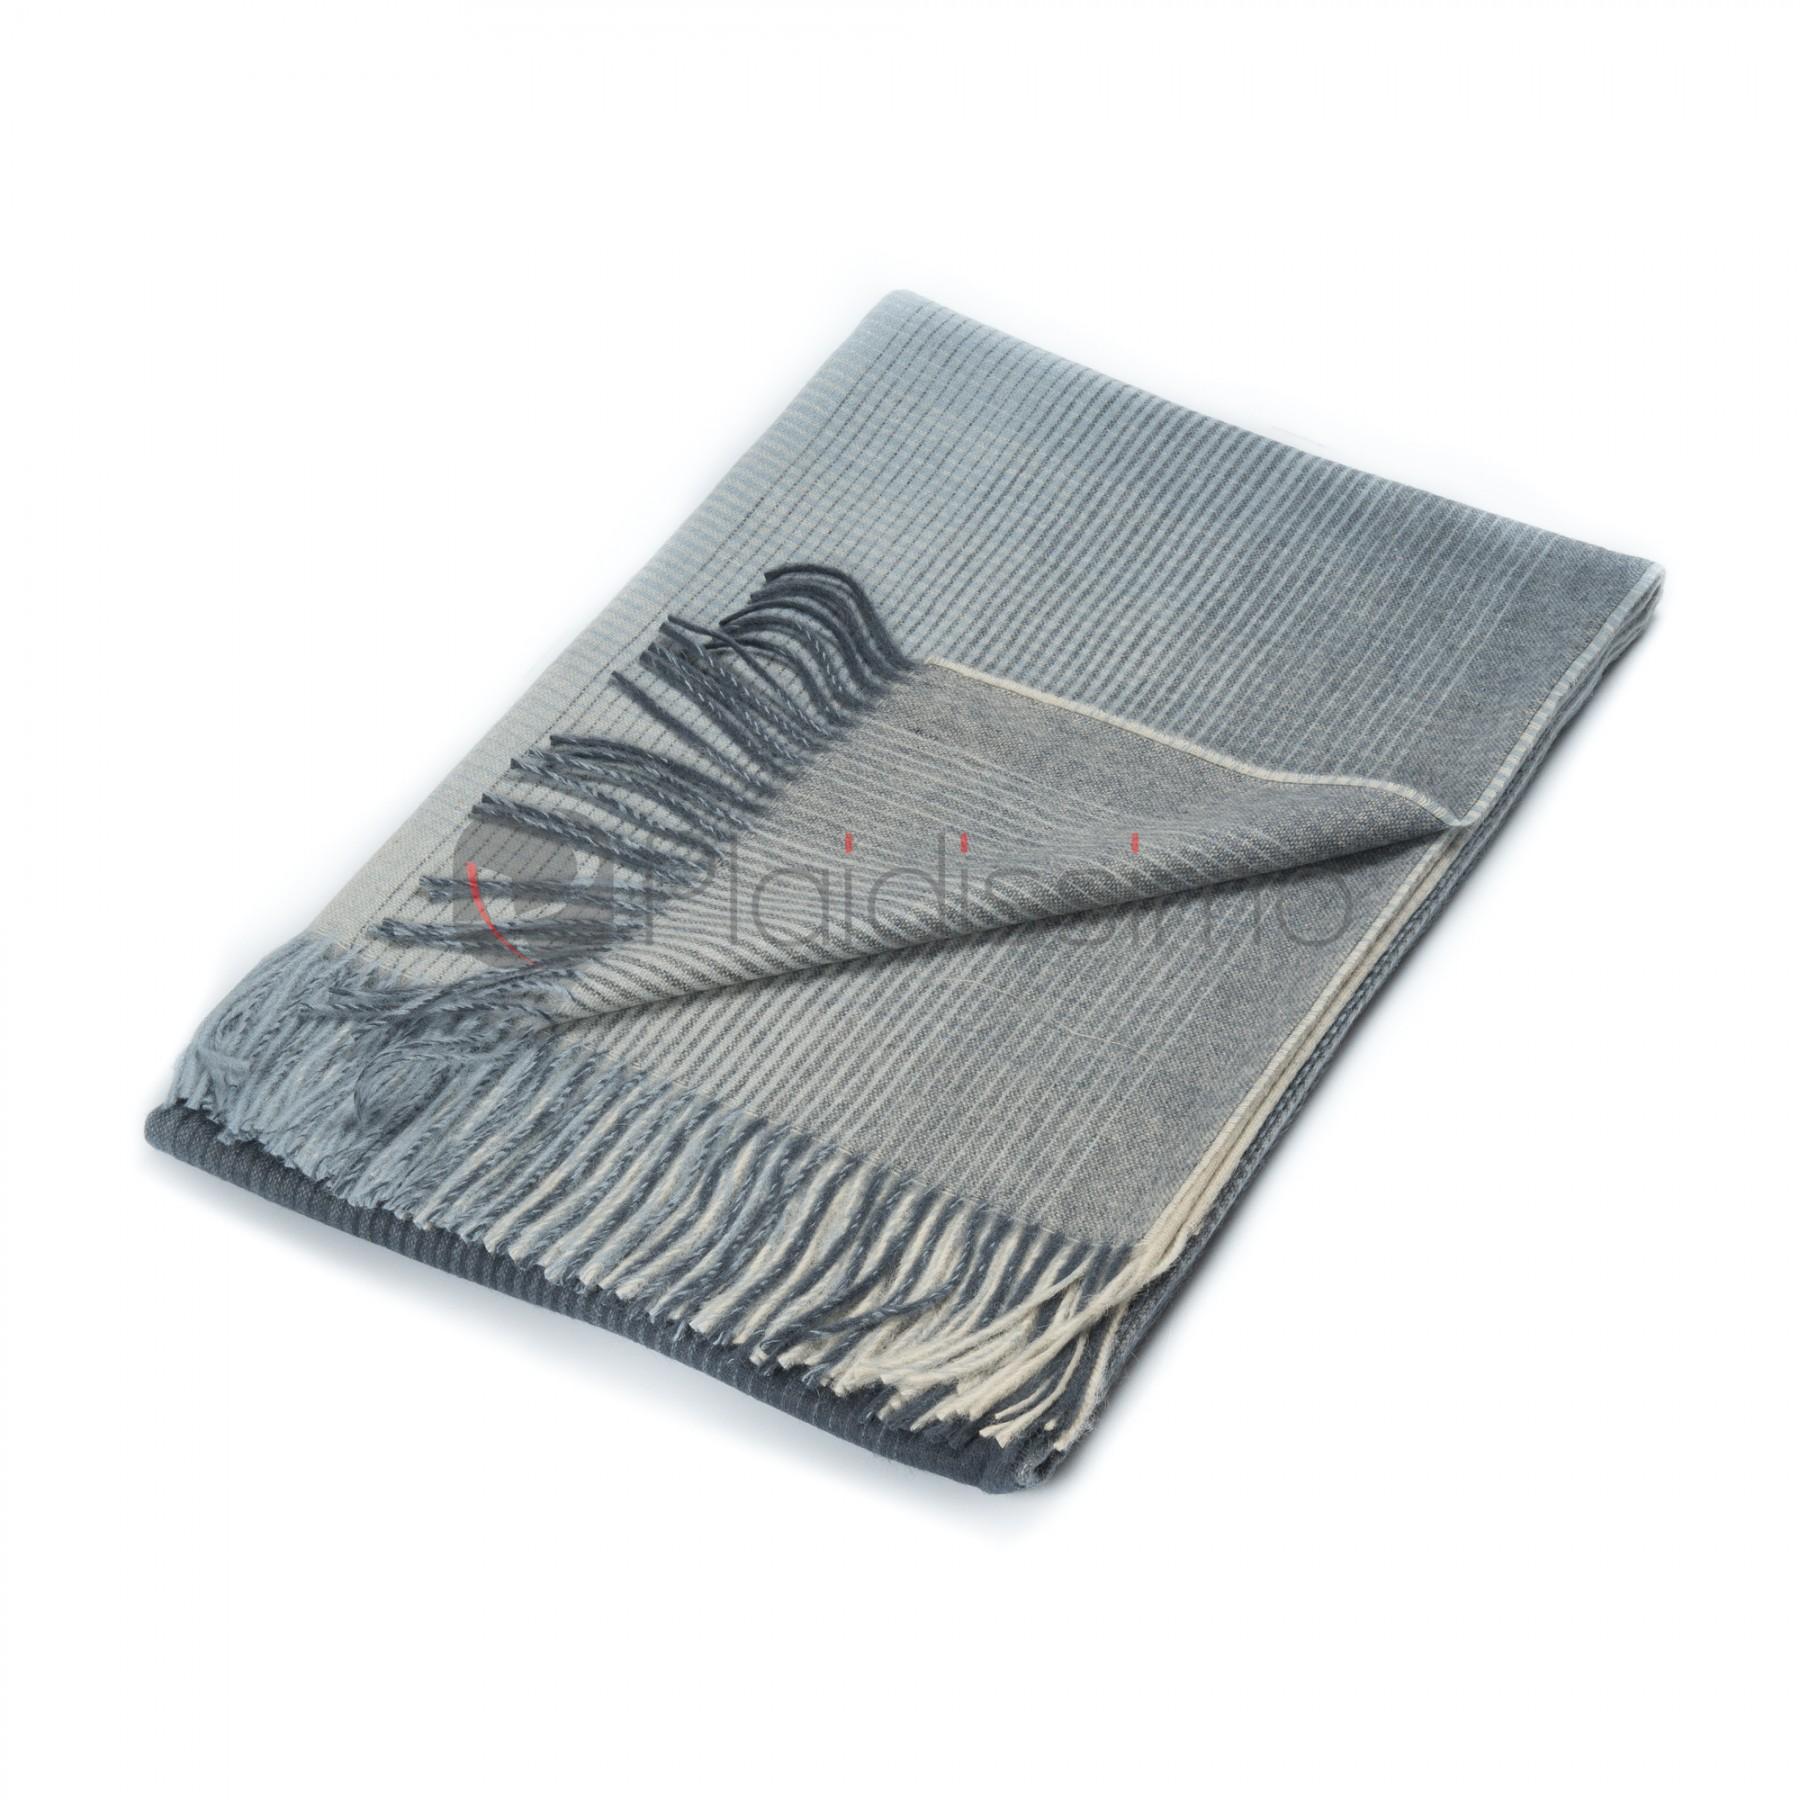 plaid en alpaga laine motif d grad de bleu horizon bleu nuit. Black Bedroom Furniture Sets. Home Design Ideas